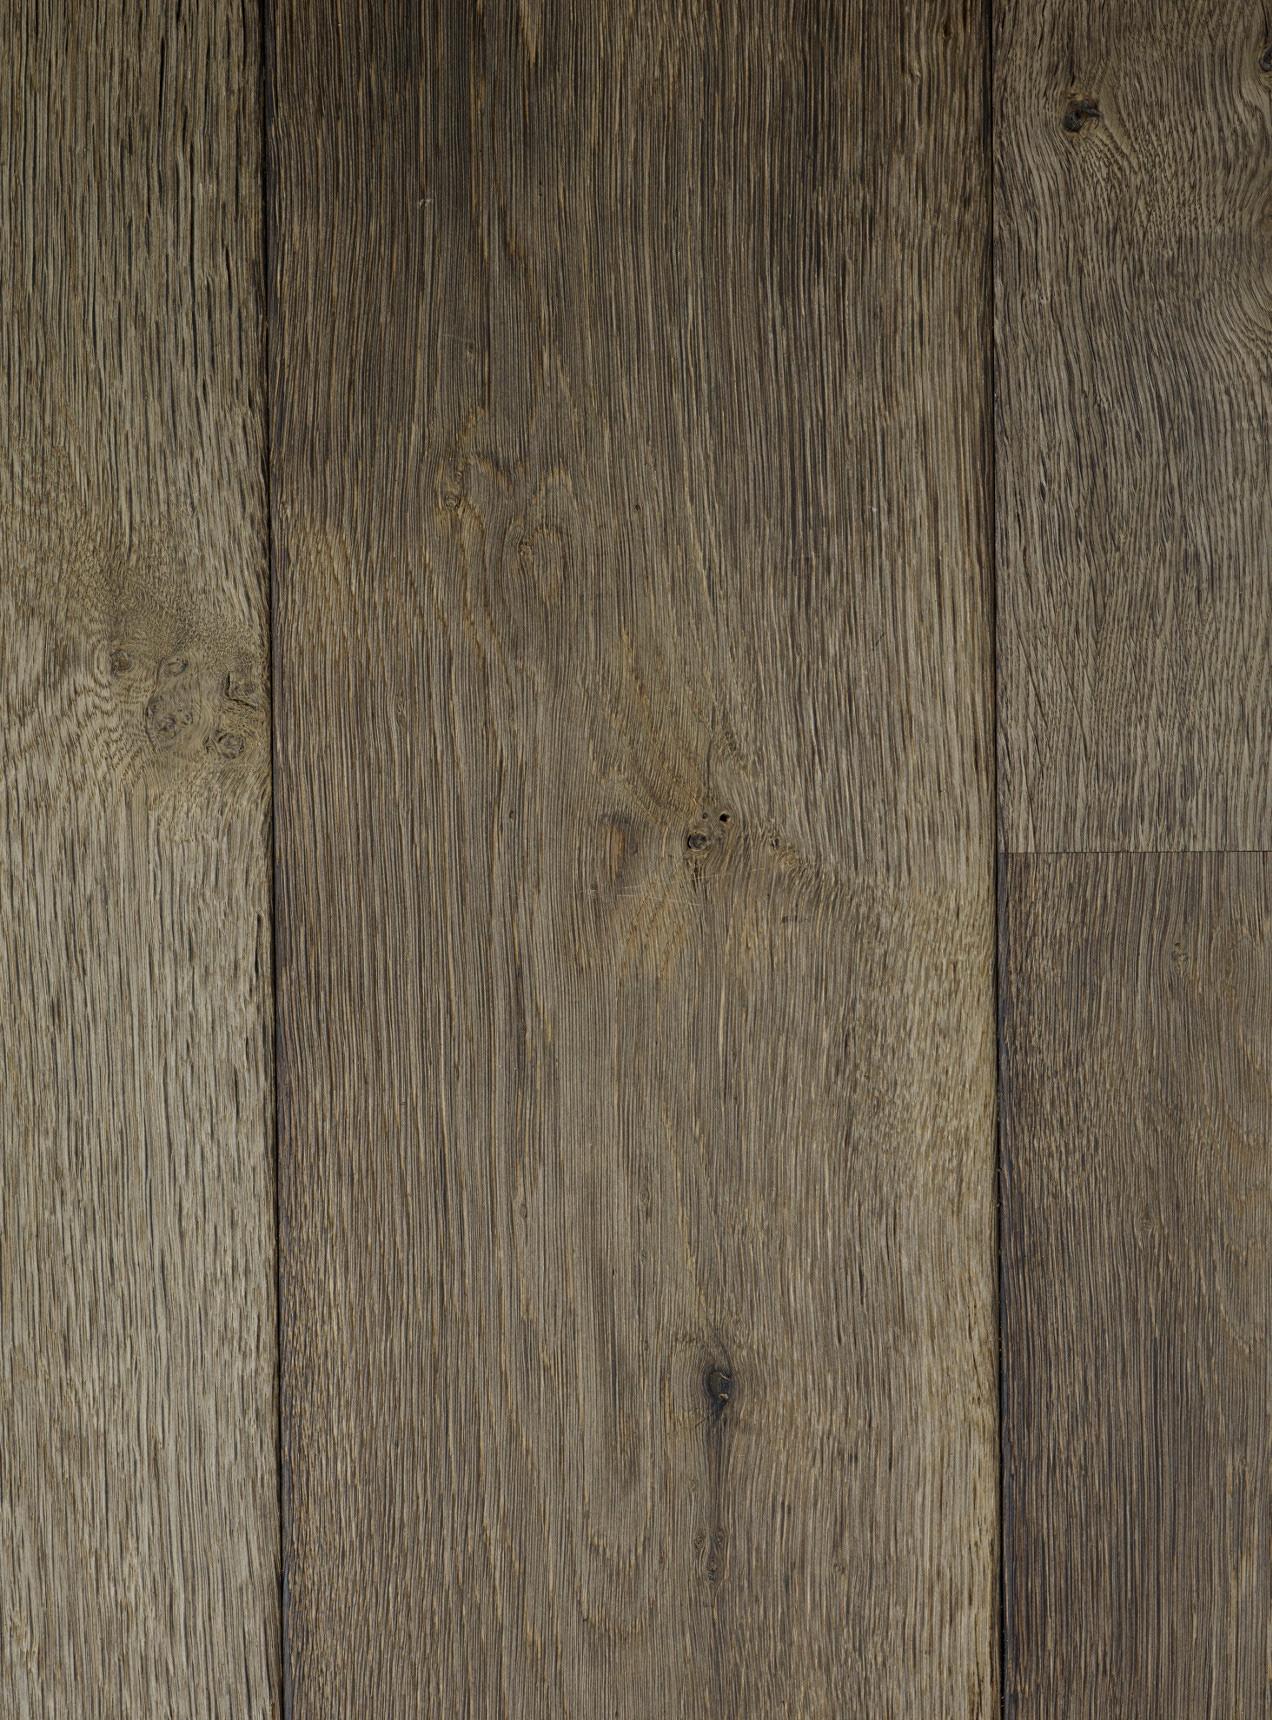 Oak magma stromboli plank